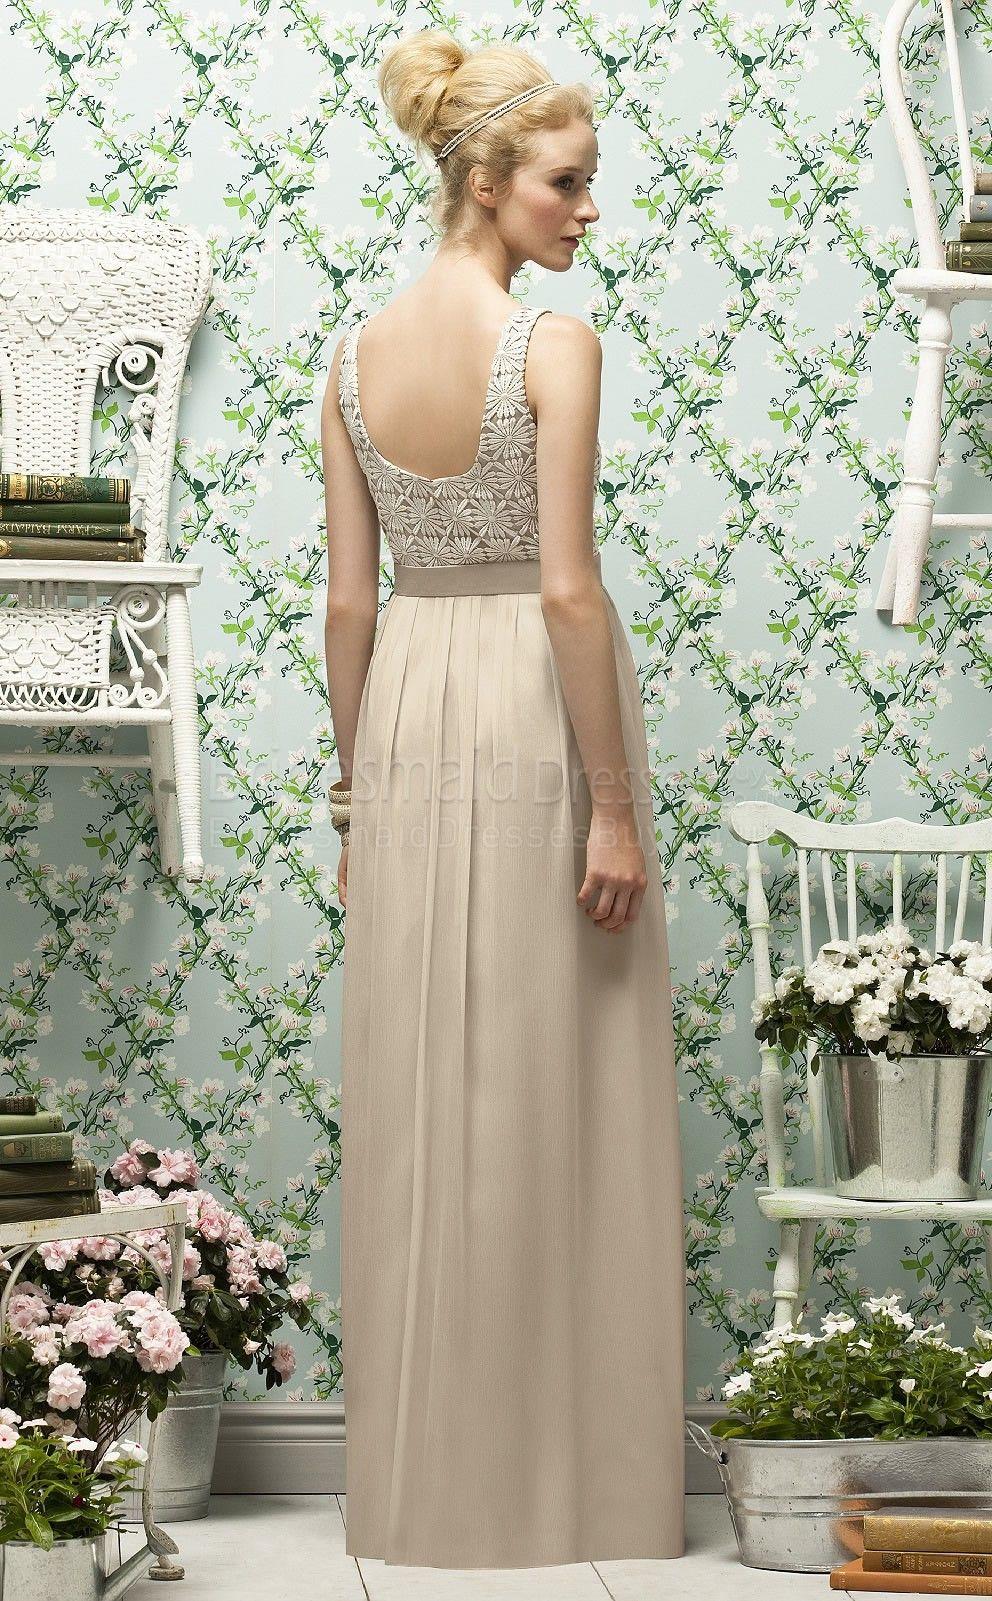 I like the lace detailing bridesmaids pinterest lace detail i like the lace detailing natural bridesmaids dressesvintage ombrellifo Choice Image